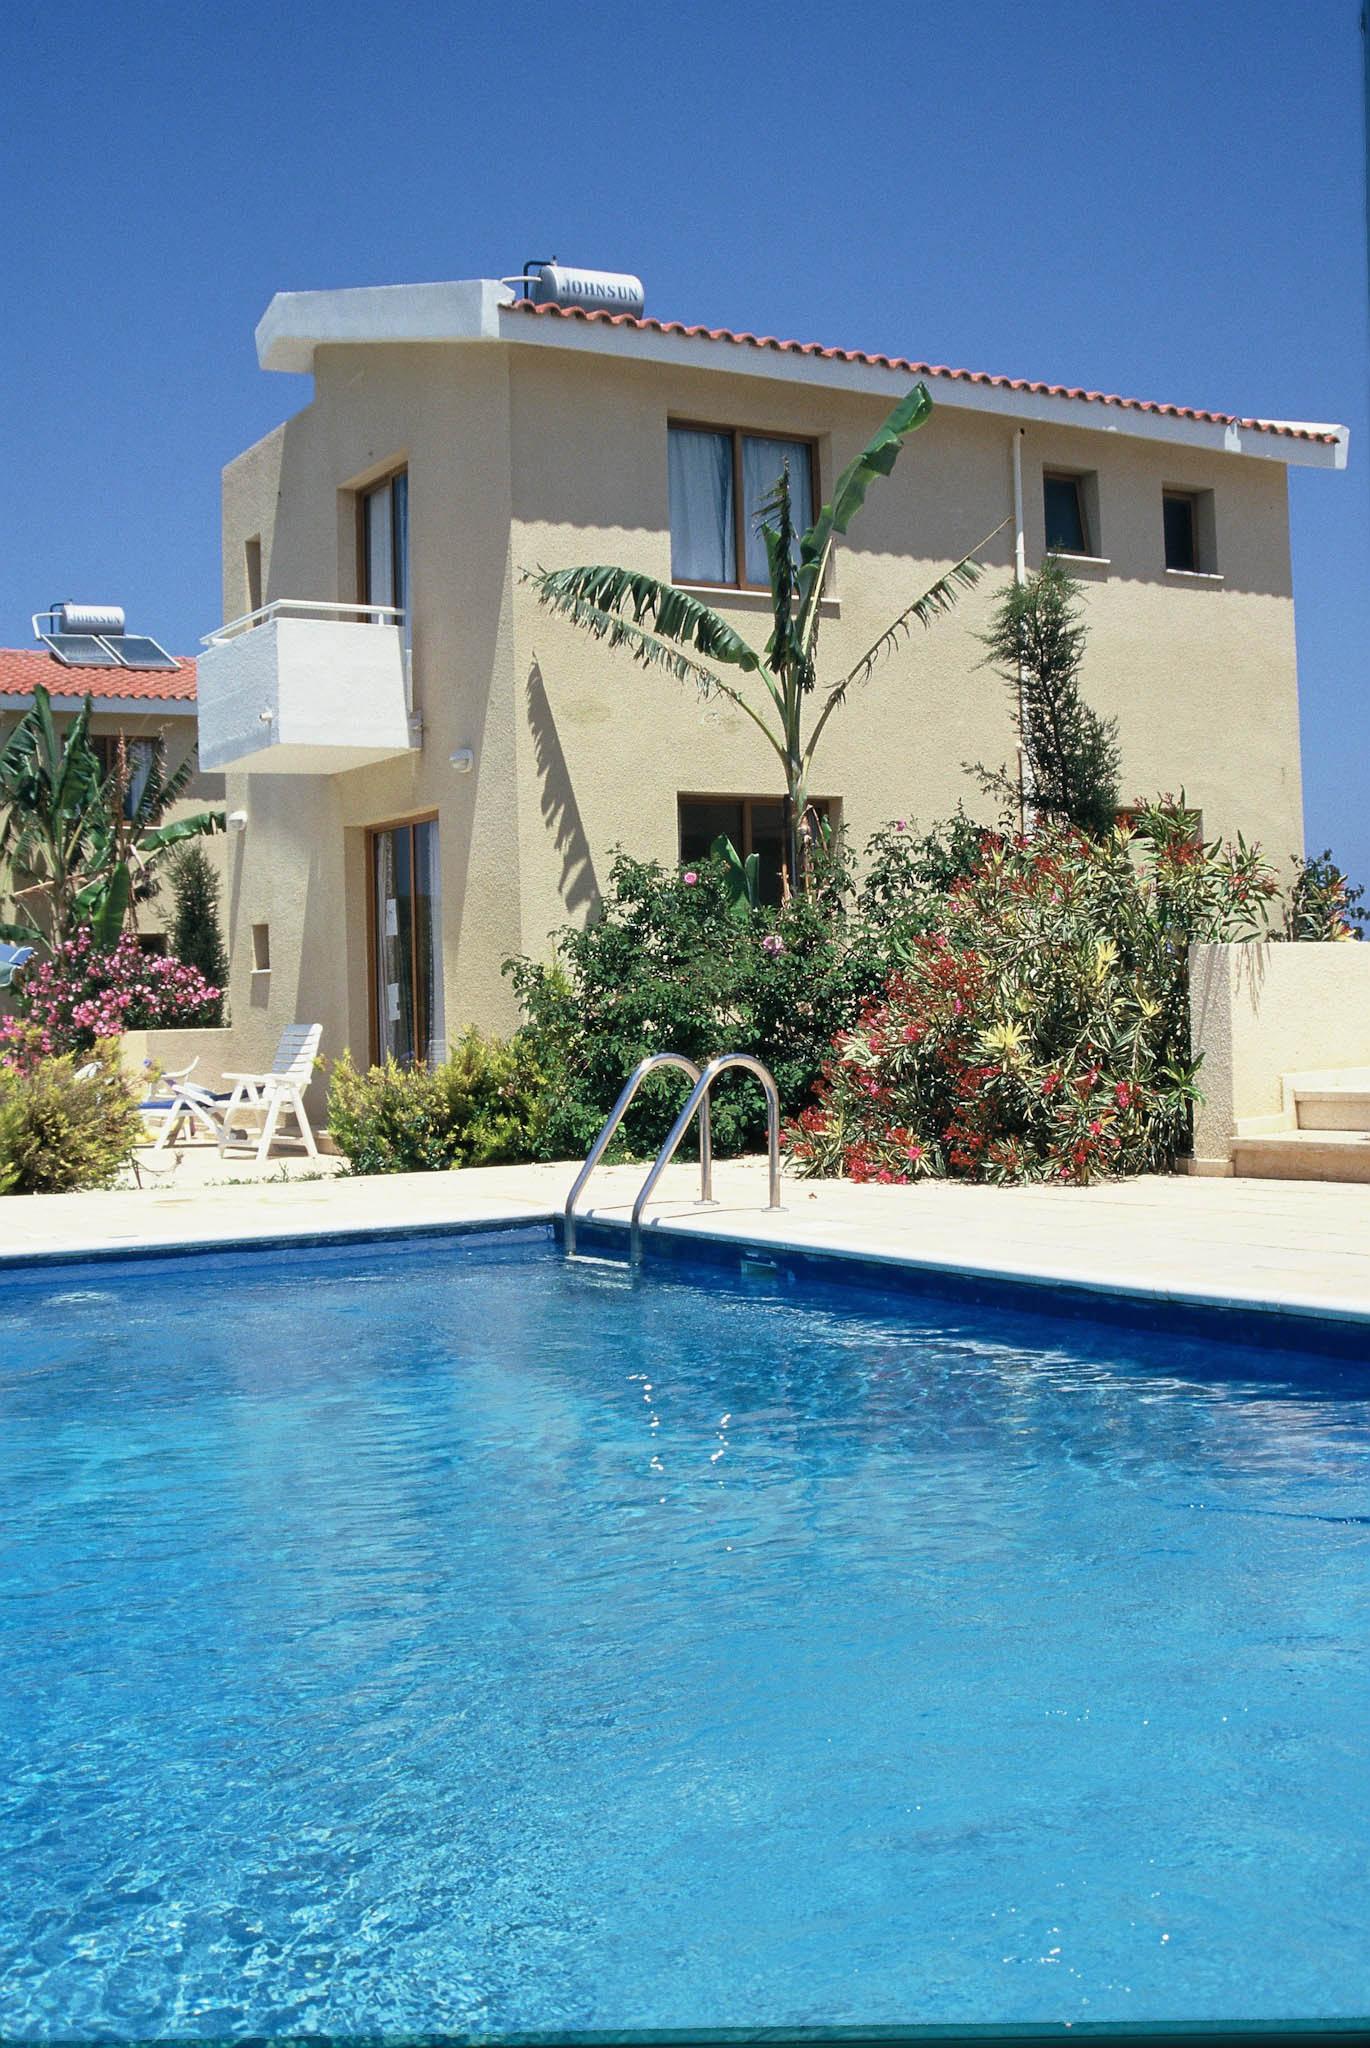 2. Three bedroom villa swimming pool